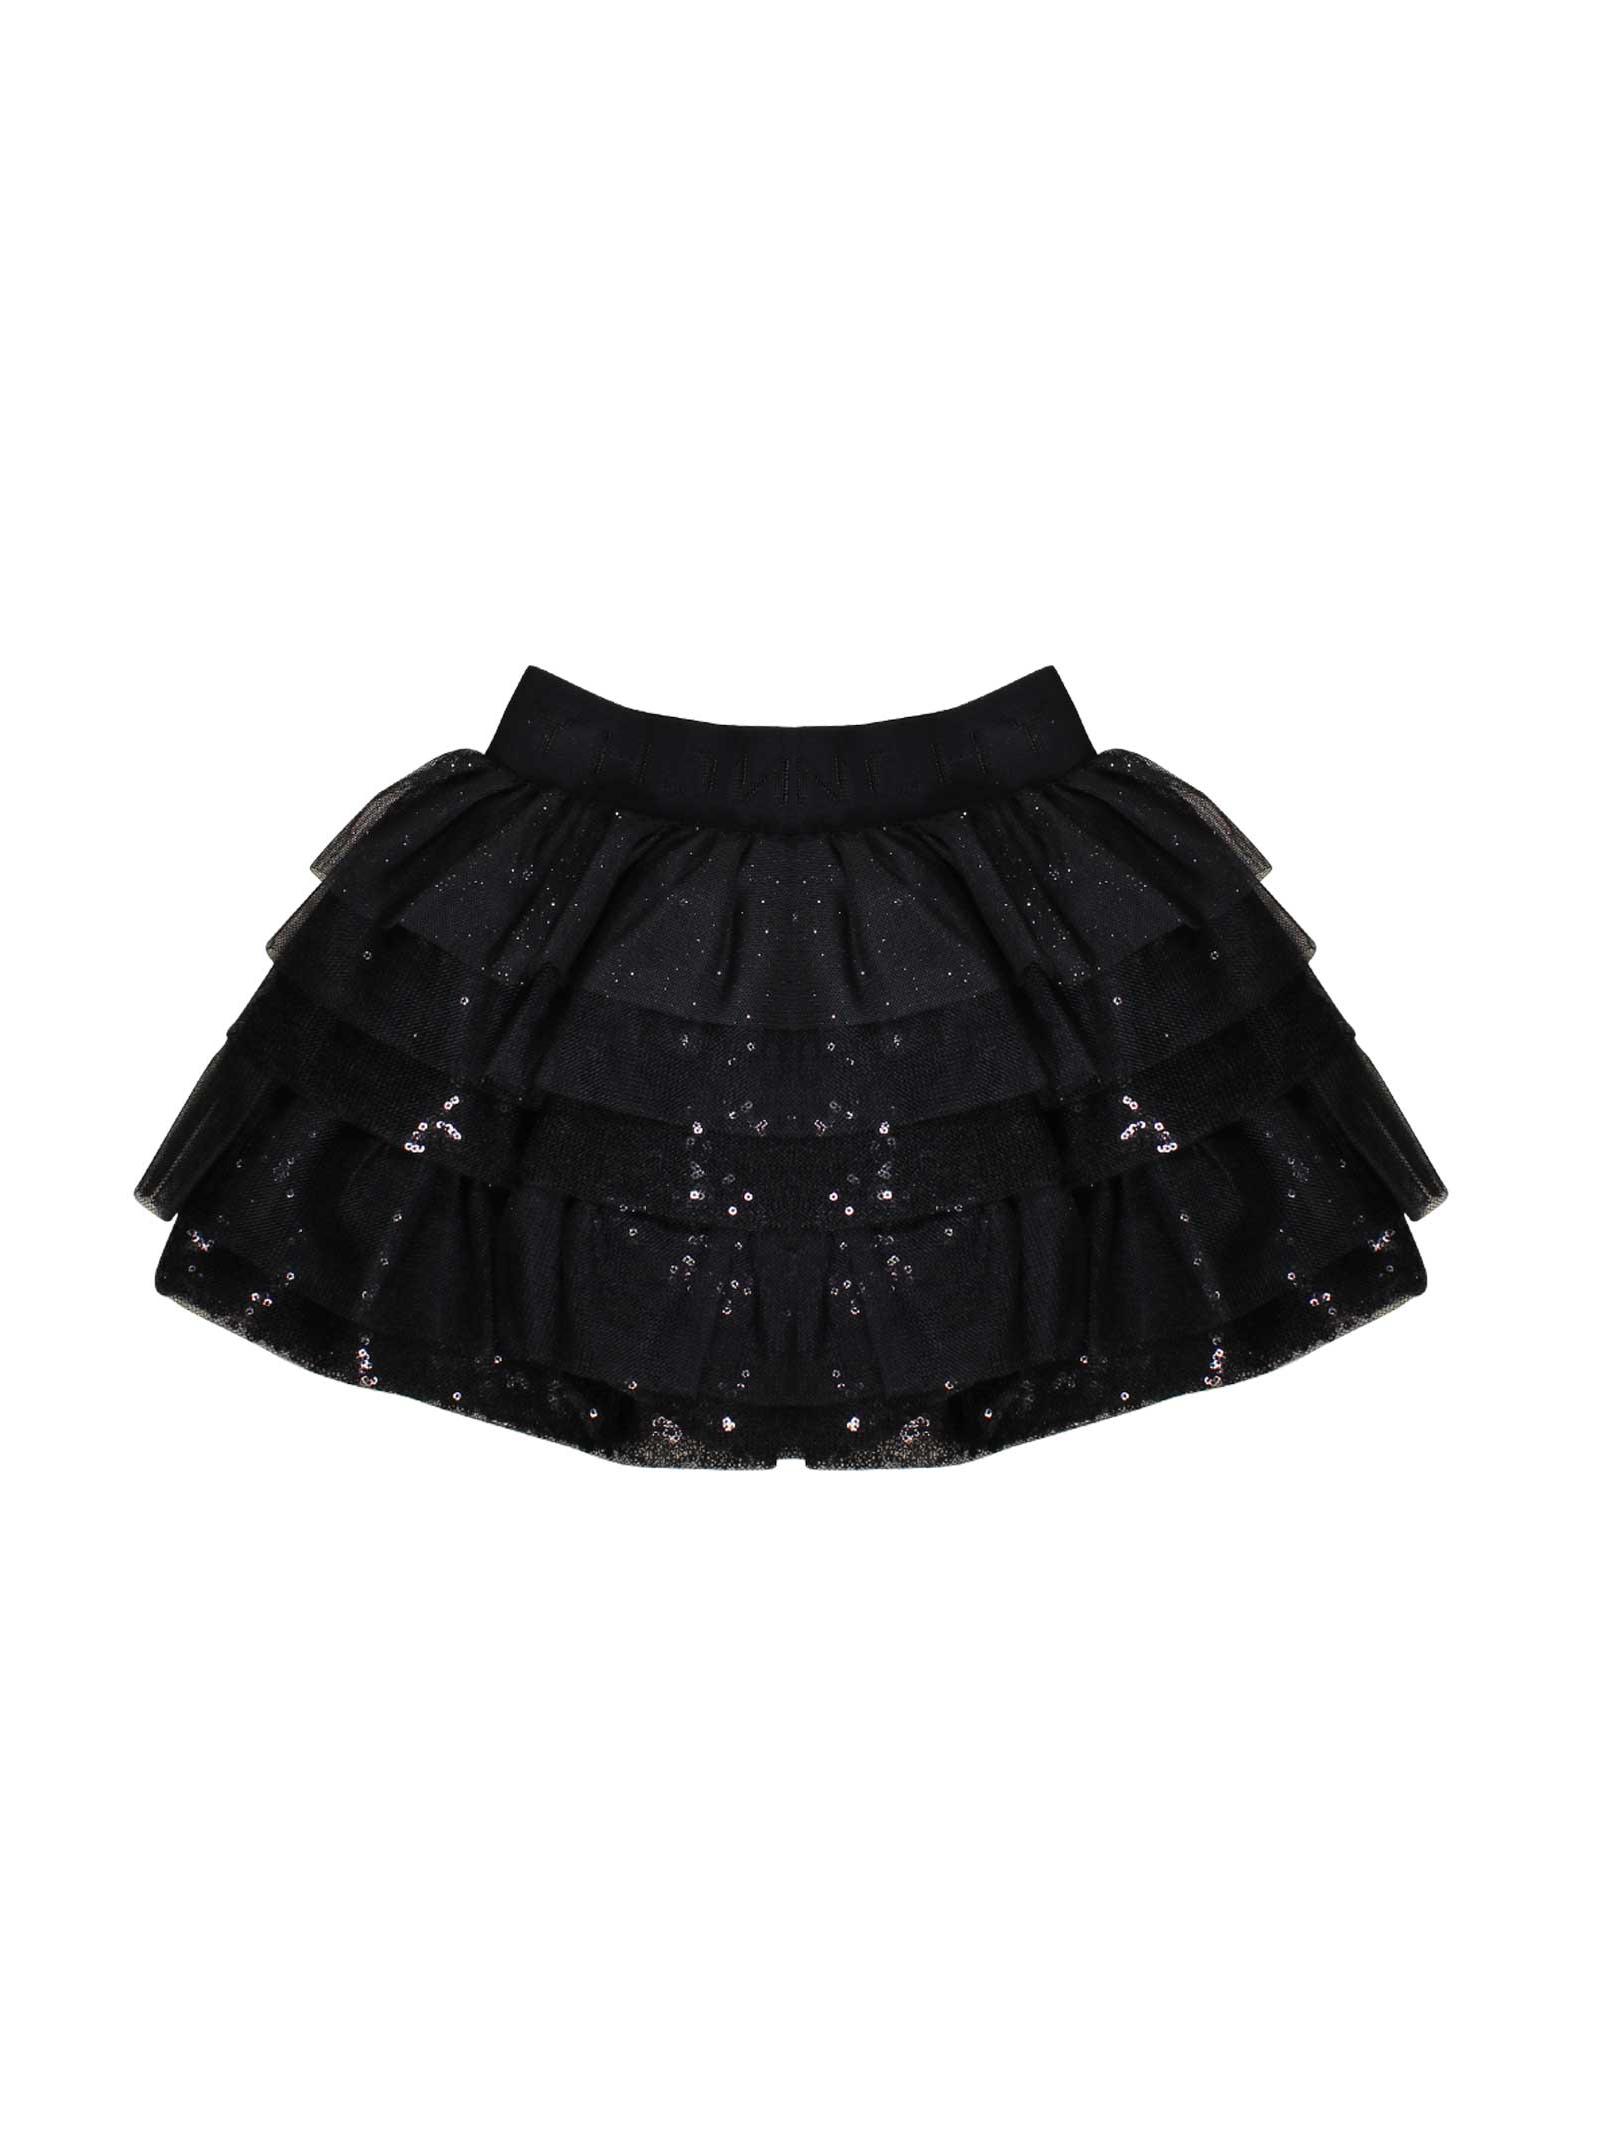 09f800eb30 ... BLACK SKIRT GIVENCHY KIDS TEEN Givenchy Kids | 15 | H1301809BT ...